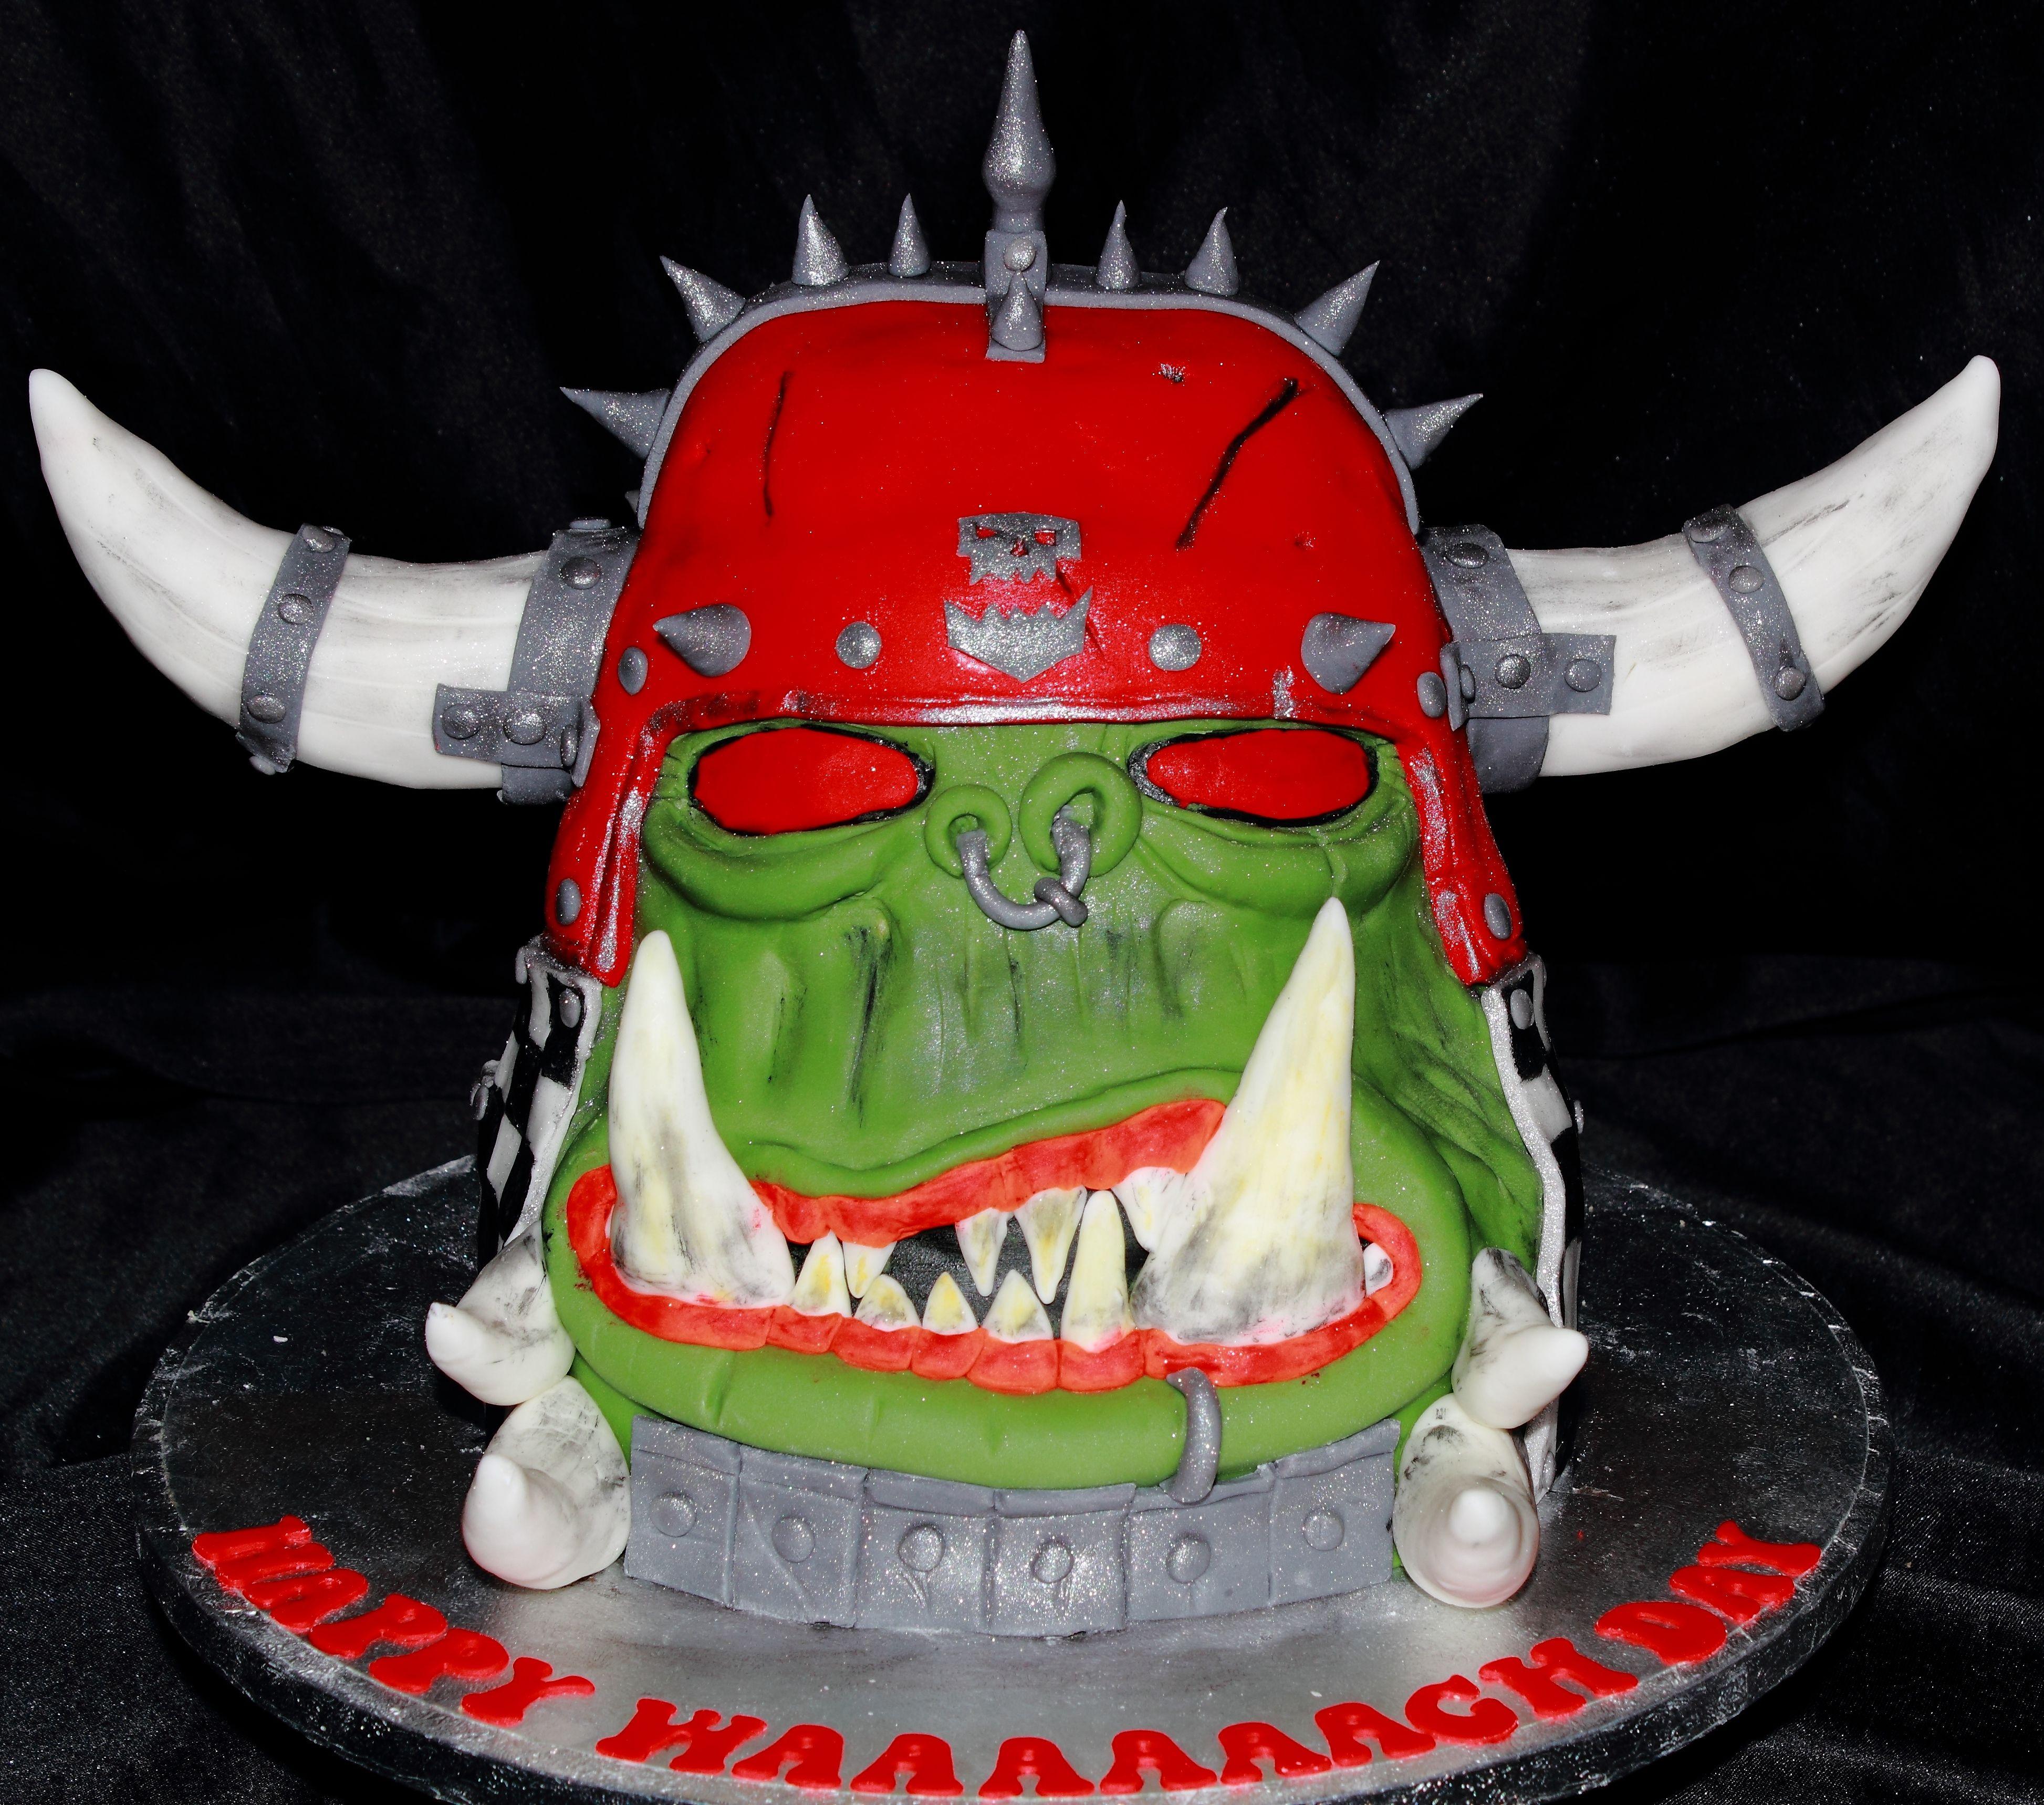 warhammer ork cake Wolf cake, Cake, Birthday cake